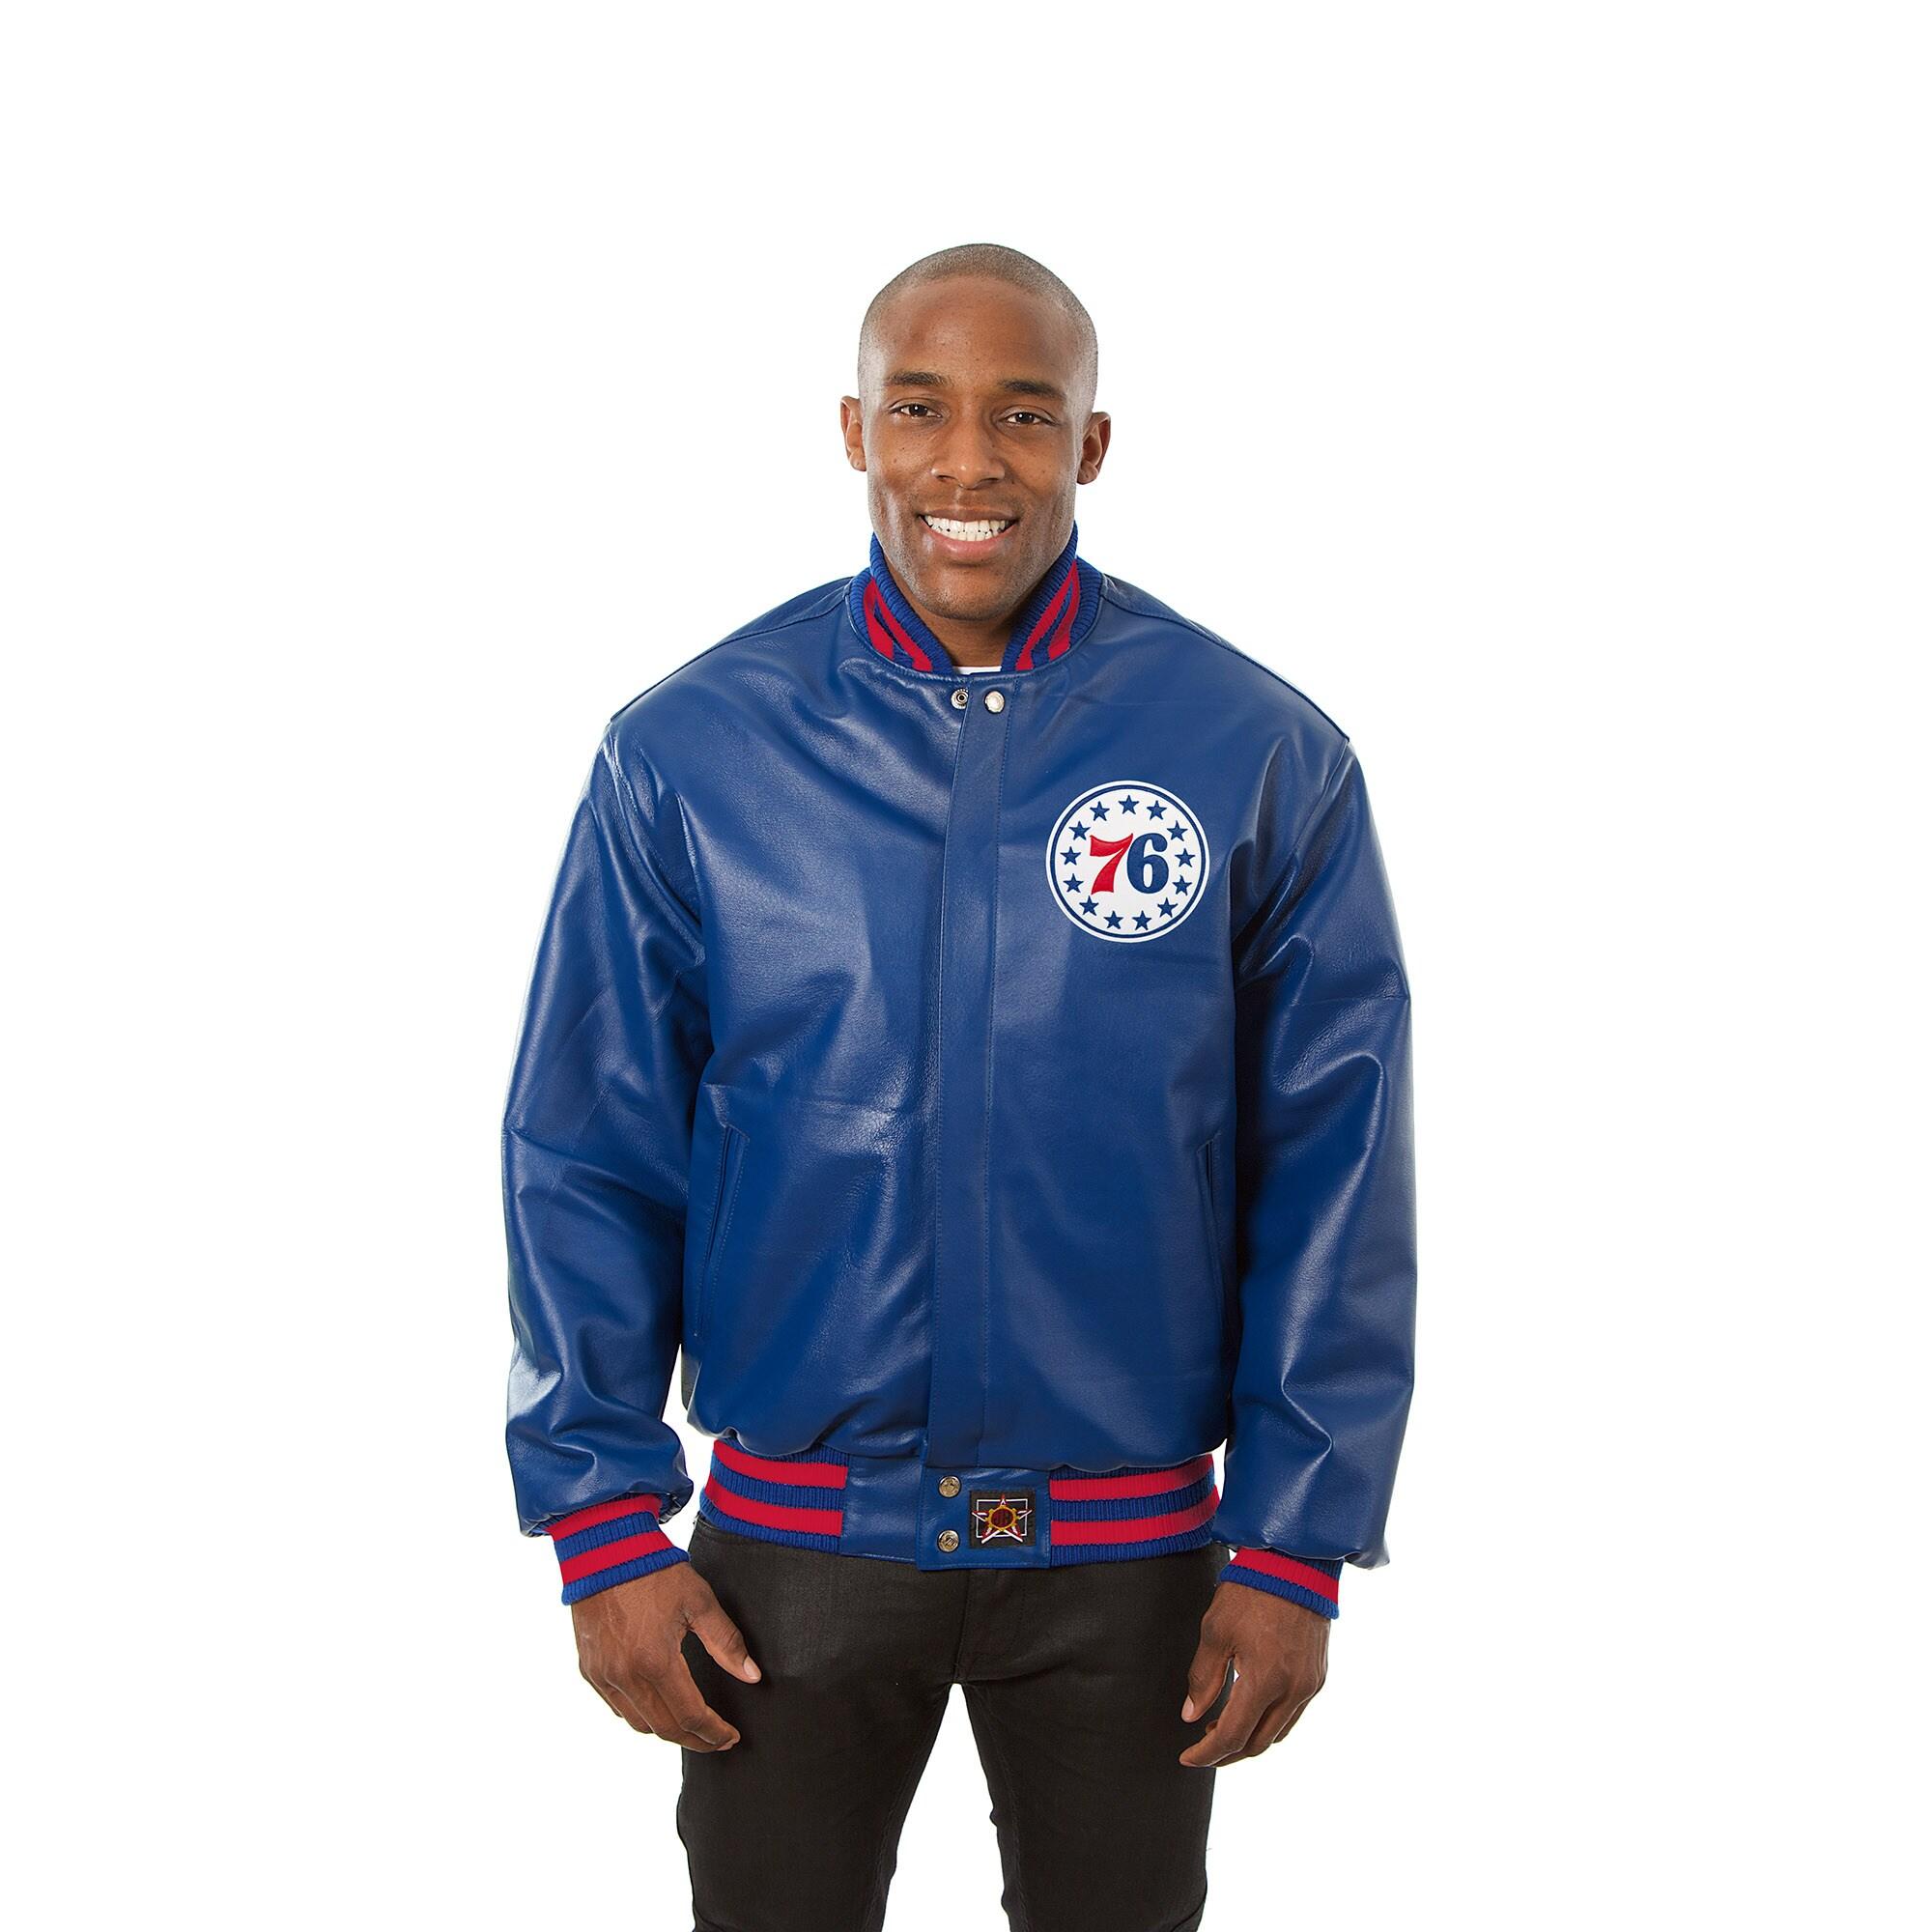 Philadelphia 76ers JH Design Domestic Team Color Leather Jacket - Royal